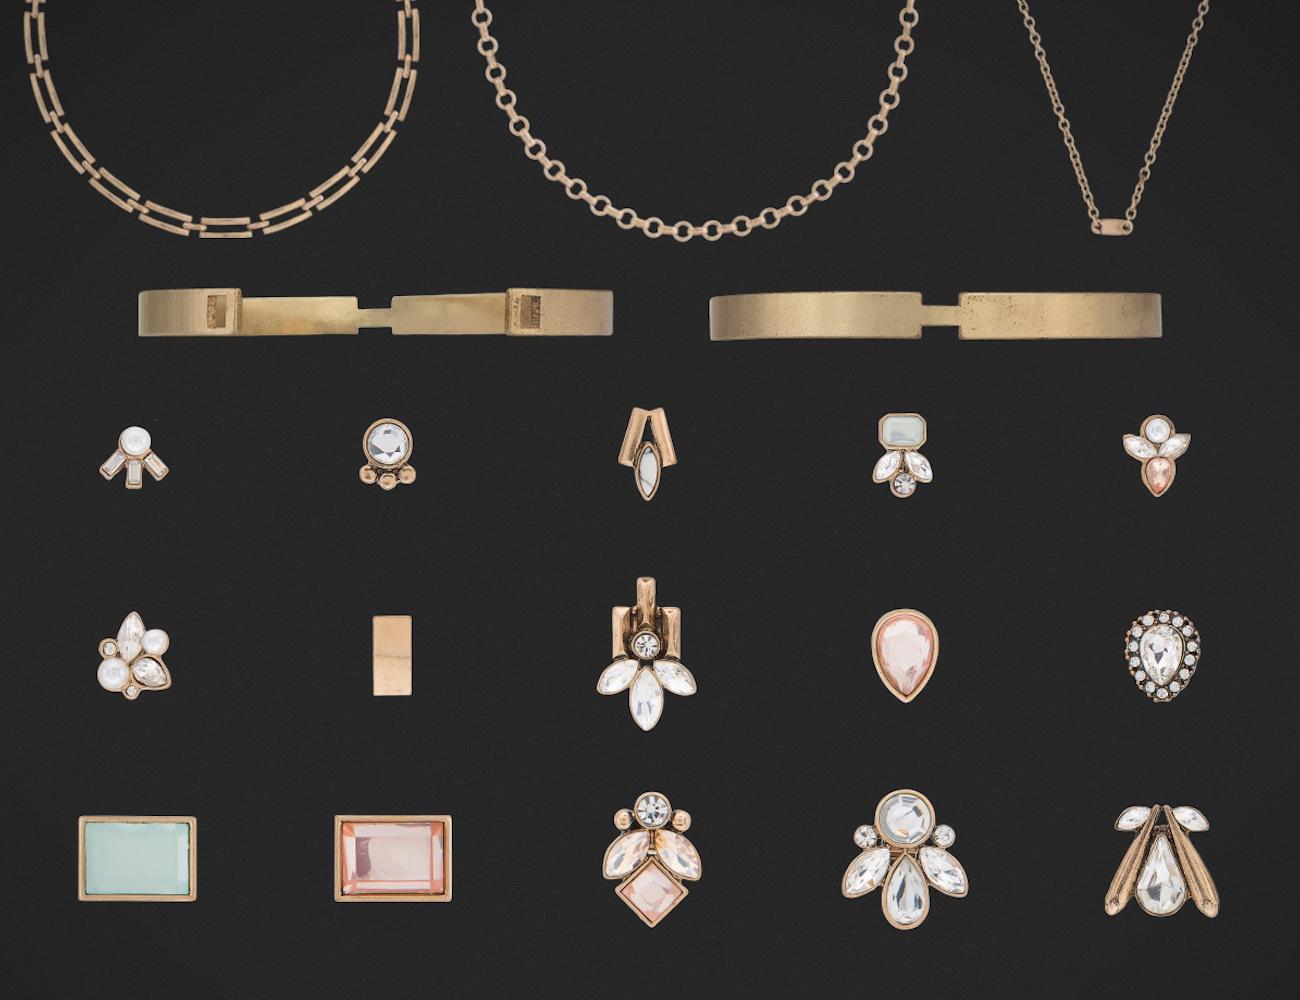 Mixers Modular Jewelry System